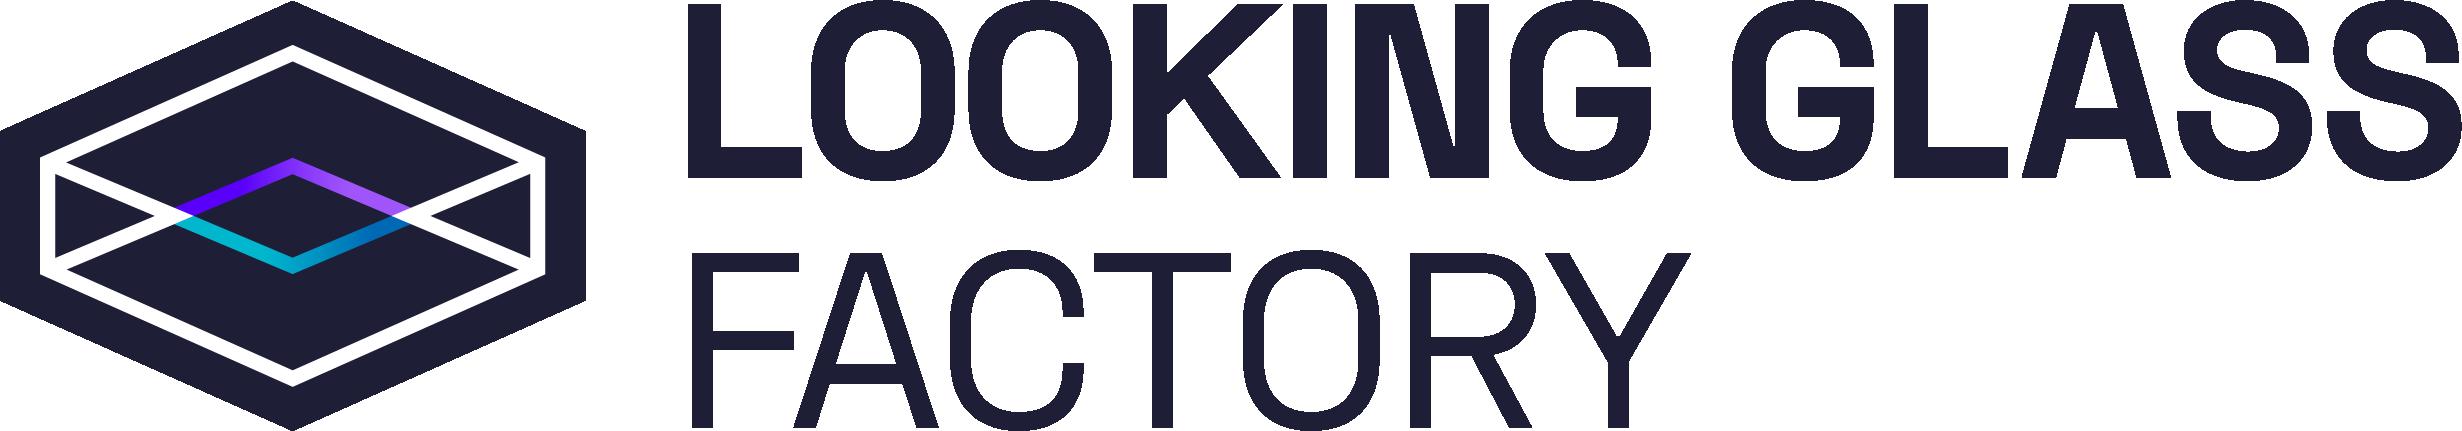 xRS Week 2019 Sponsor - Looking Glass Factory